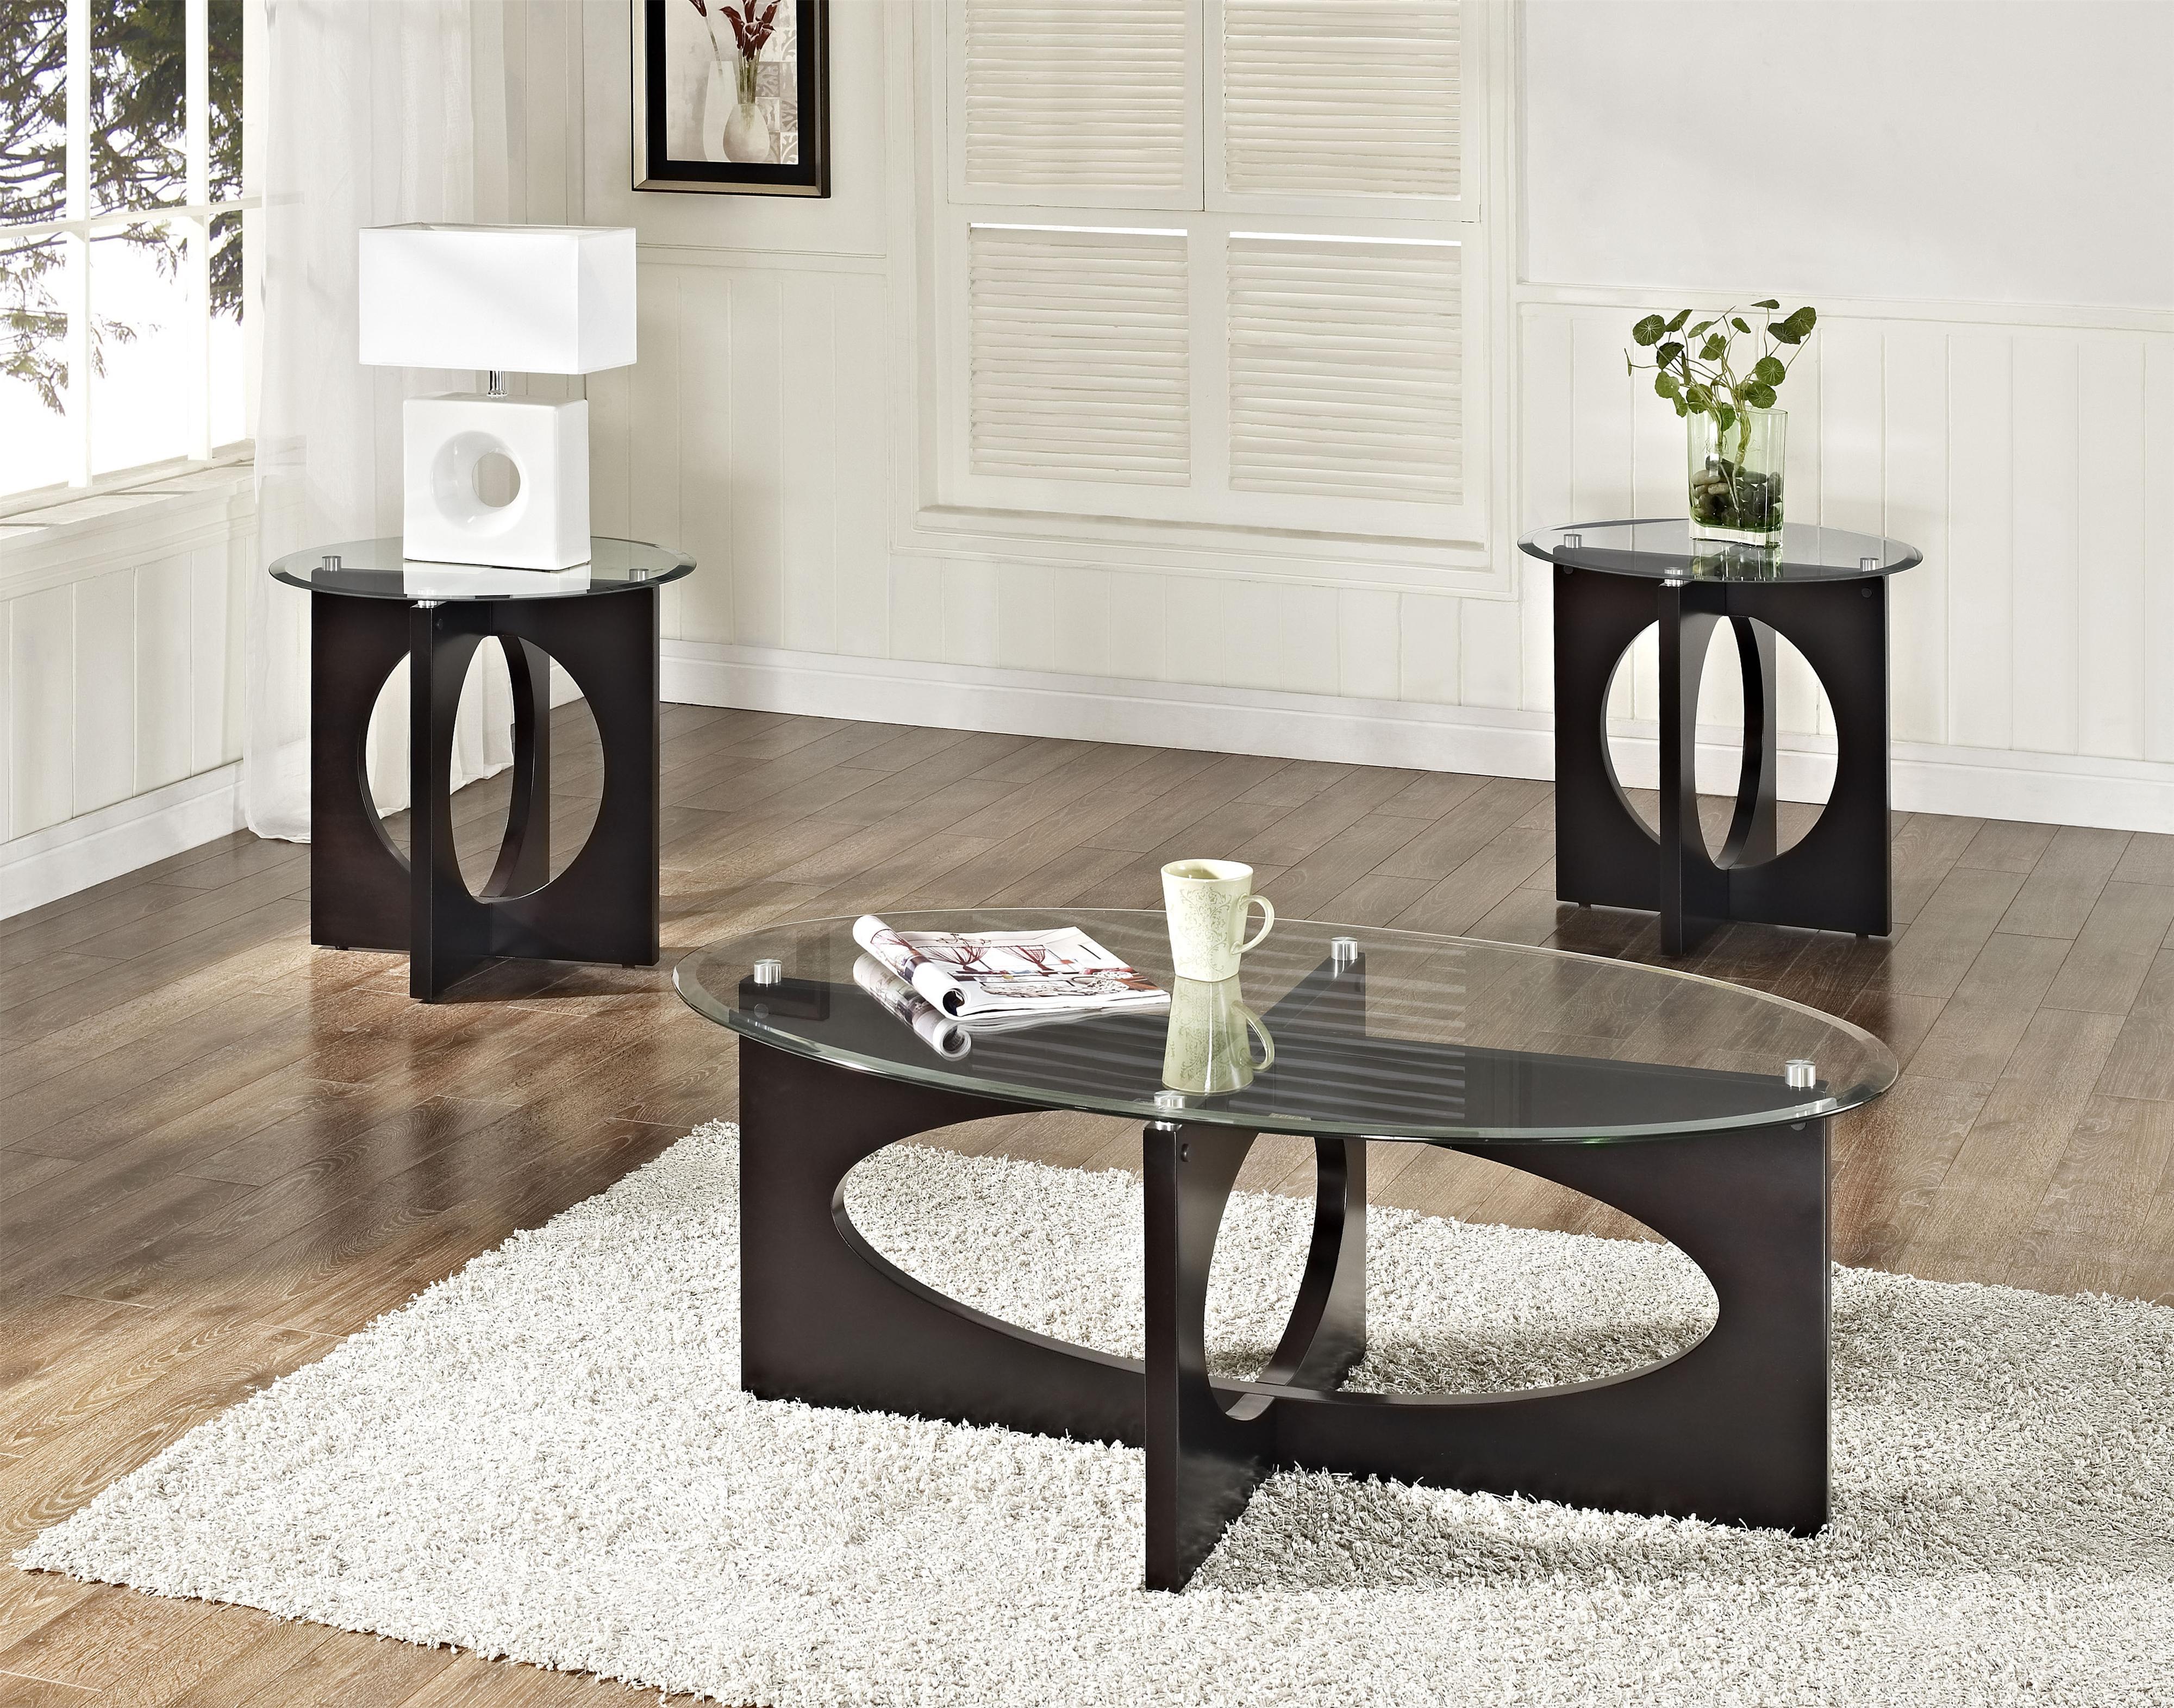 Standard Furniture Dania Occasional Table Set - Item Number: 28153